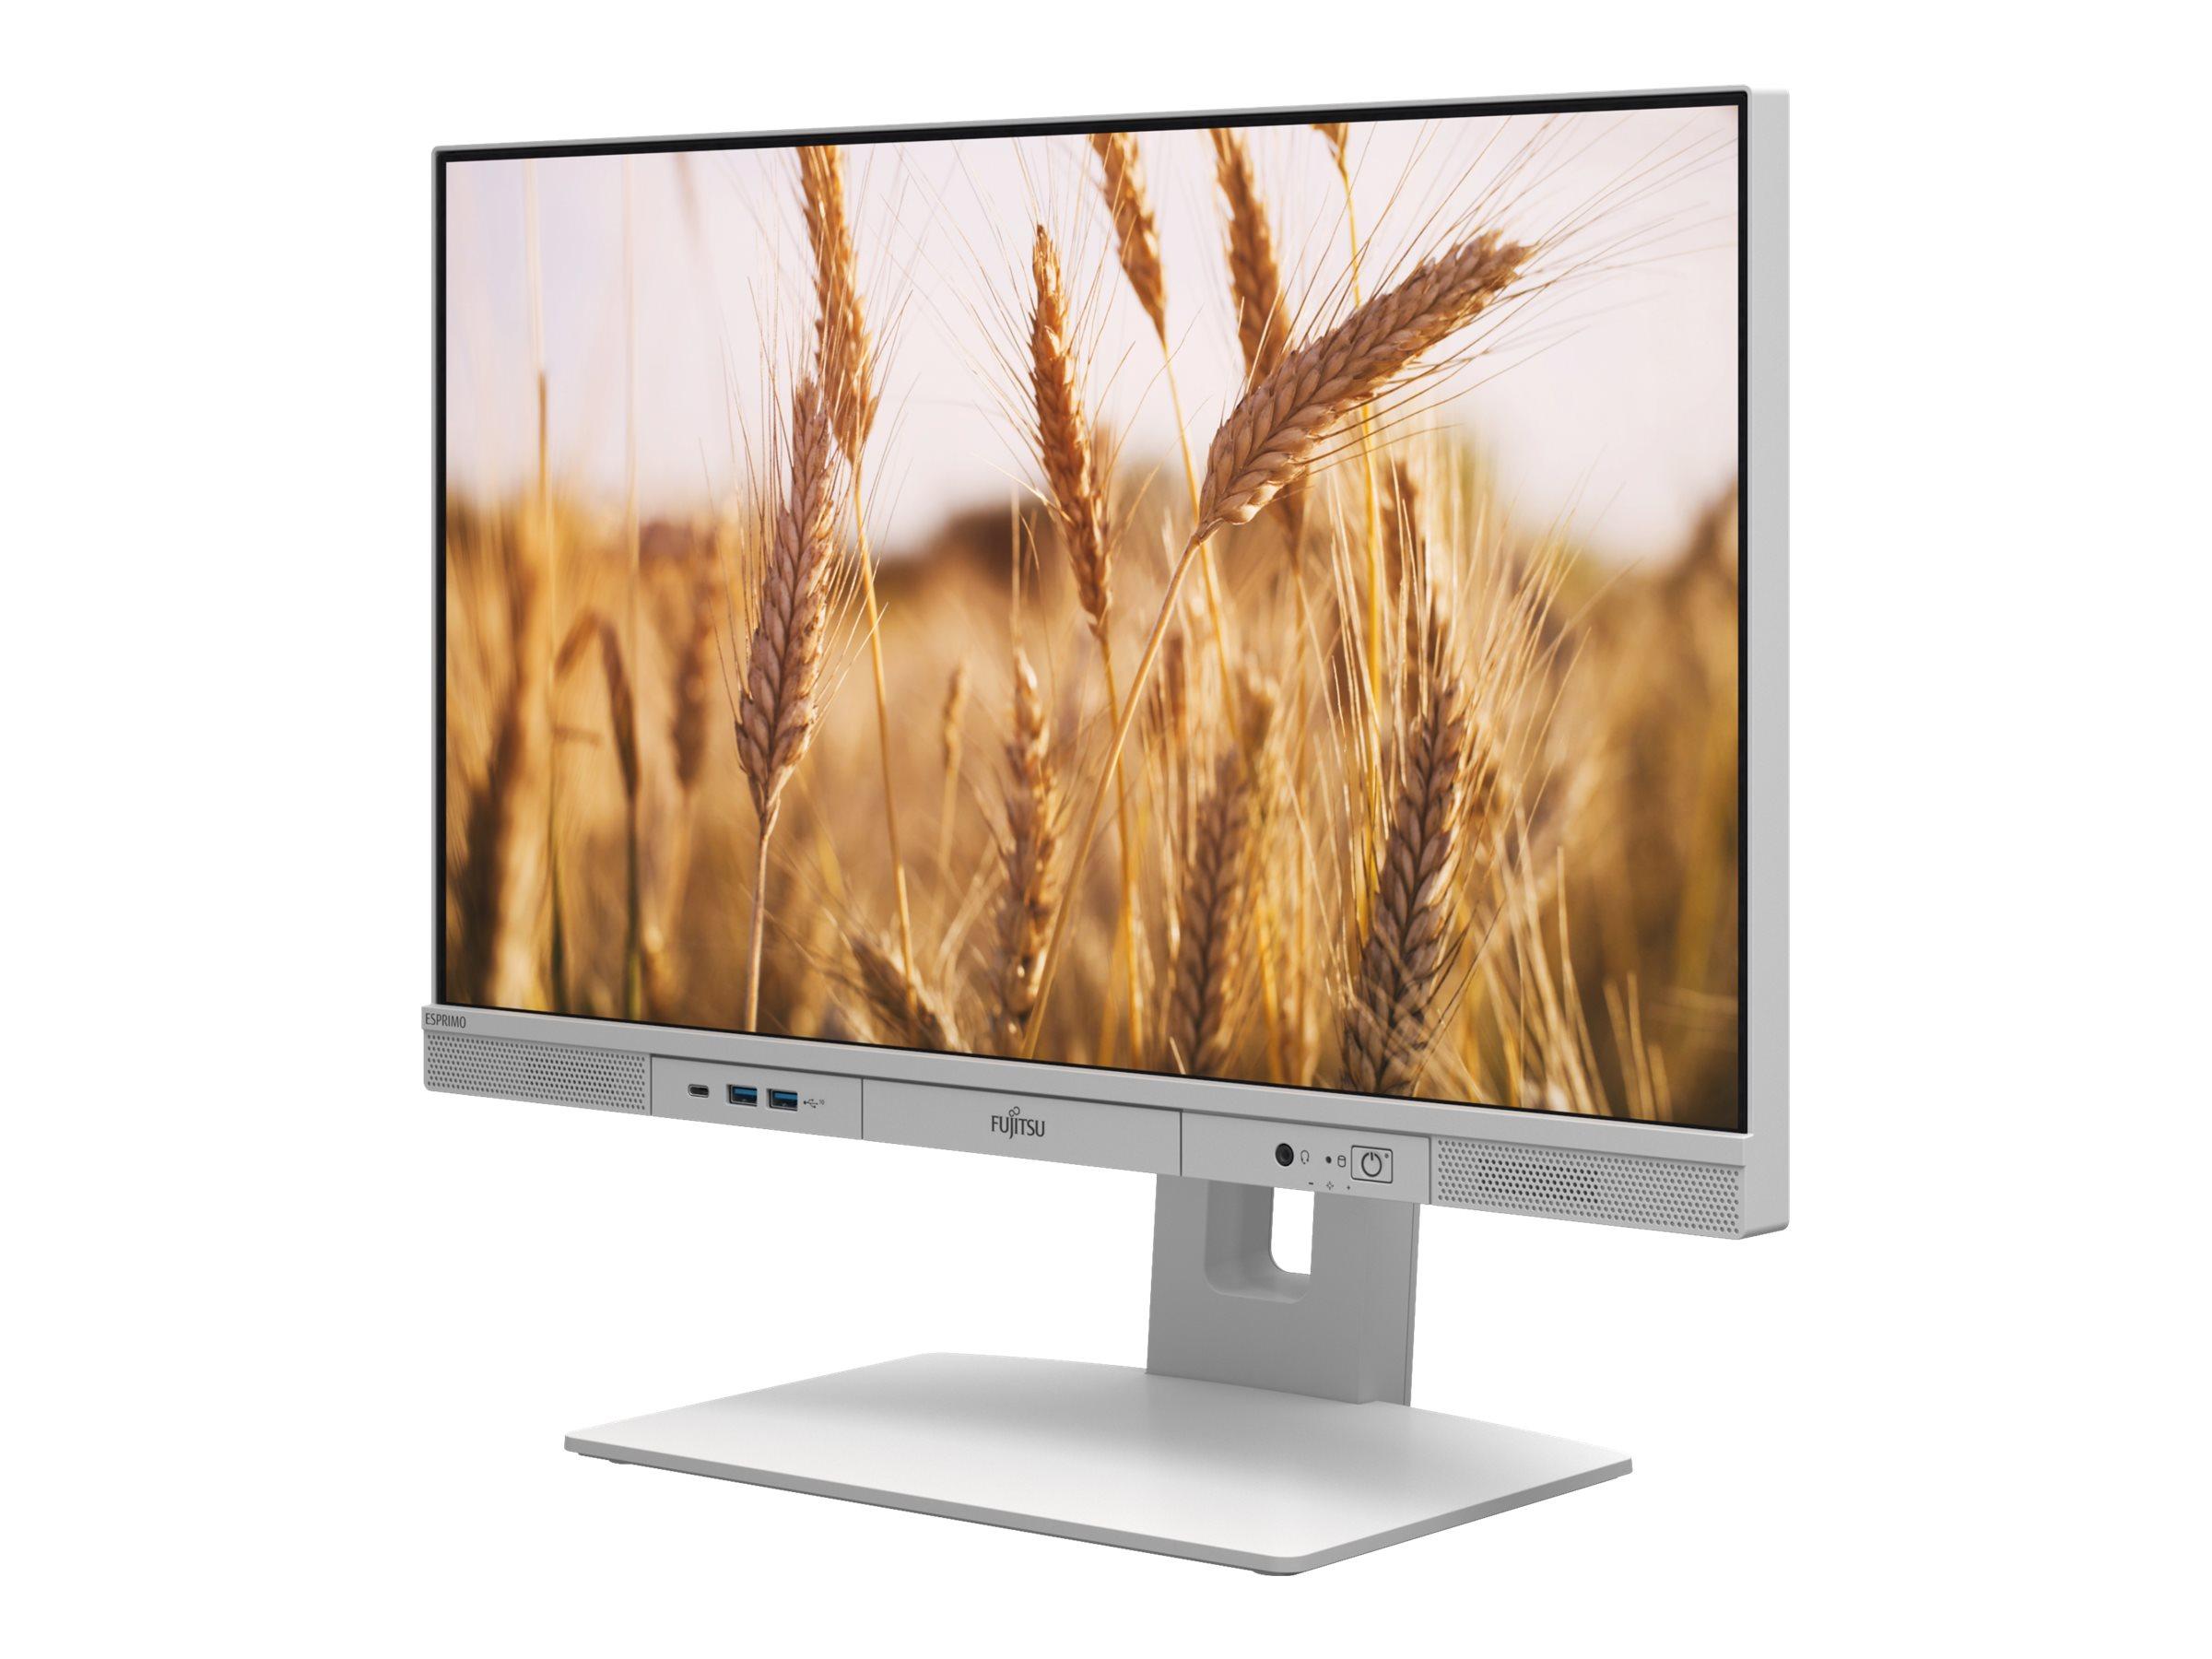 "Fujitsu ESPRIMO K5010/24 - All-in-One (Komplettlösung) - Core i5 10500 / 3.1 GHz - RAM 8 GB - SSD 256 GB - NVMe - UHD Graphics 630 - GigE - WLAN: Bluetooth 5.0, 802.11a/b/g/n/ac/ax - Win 10 Pro 64-Bit - Monitor: LED 60.5 cm (23.8"")"